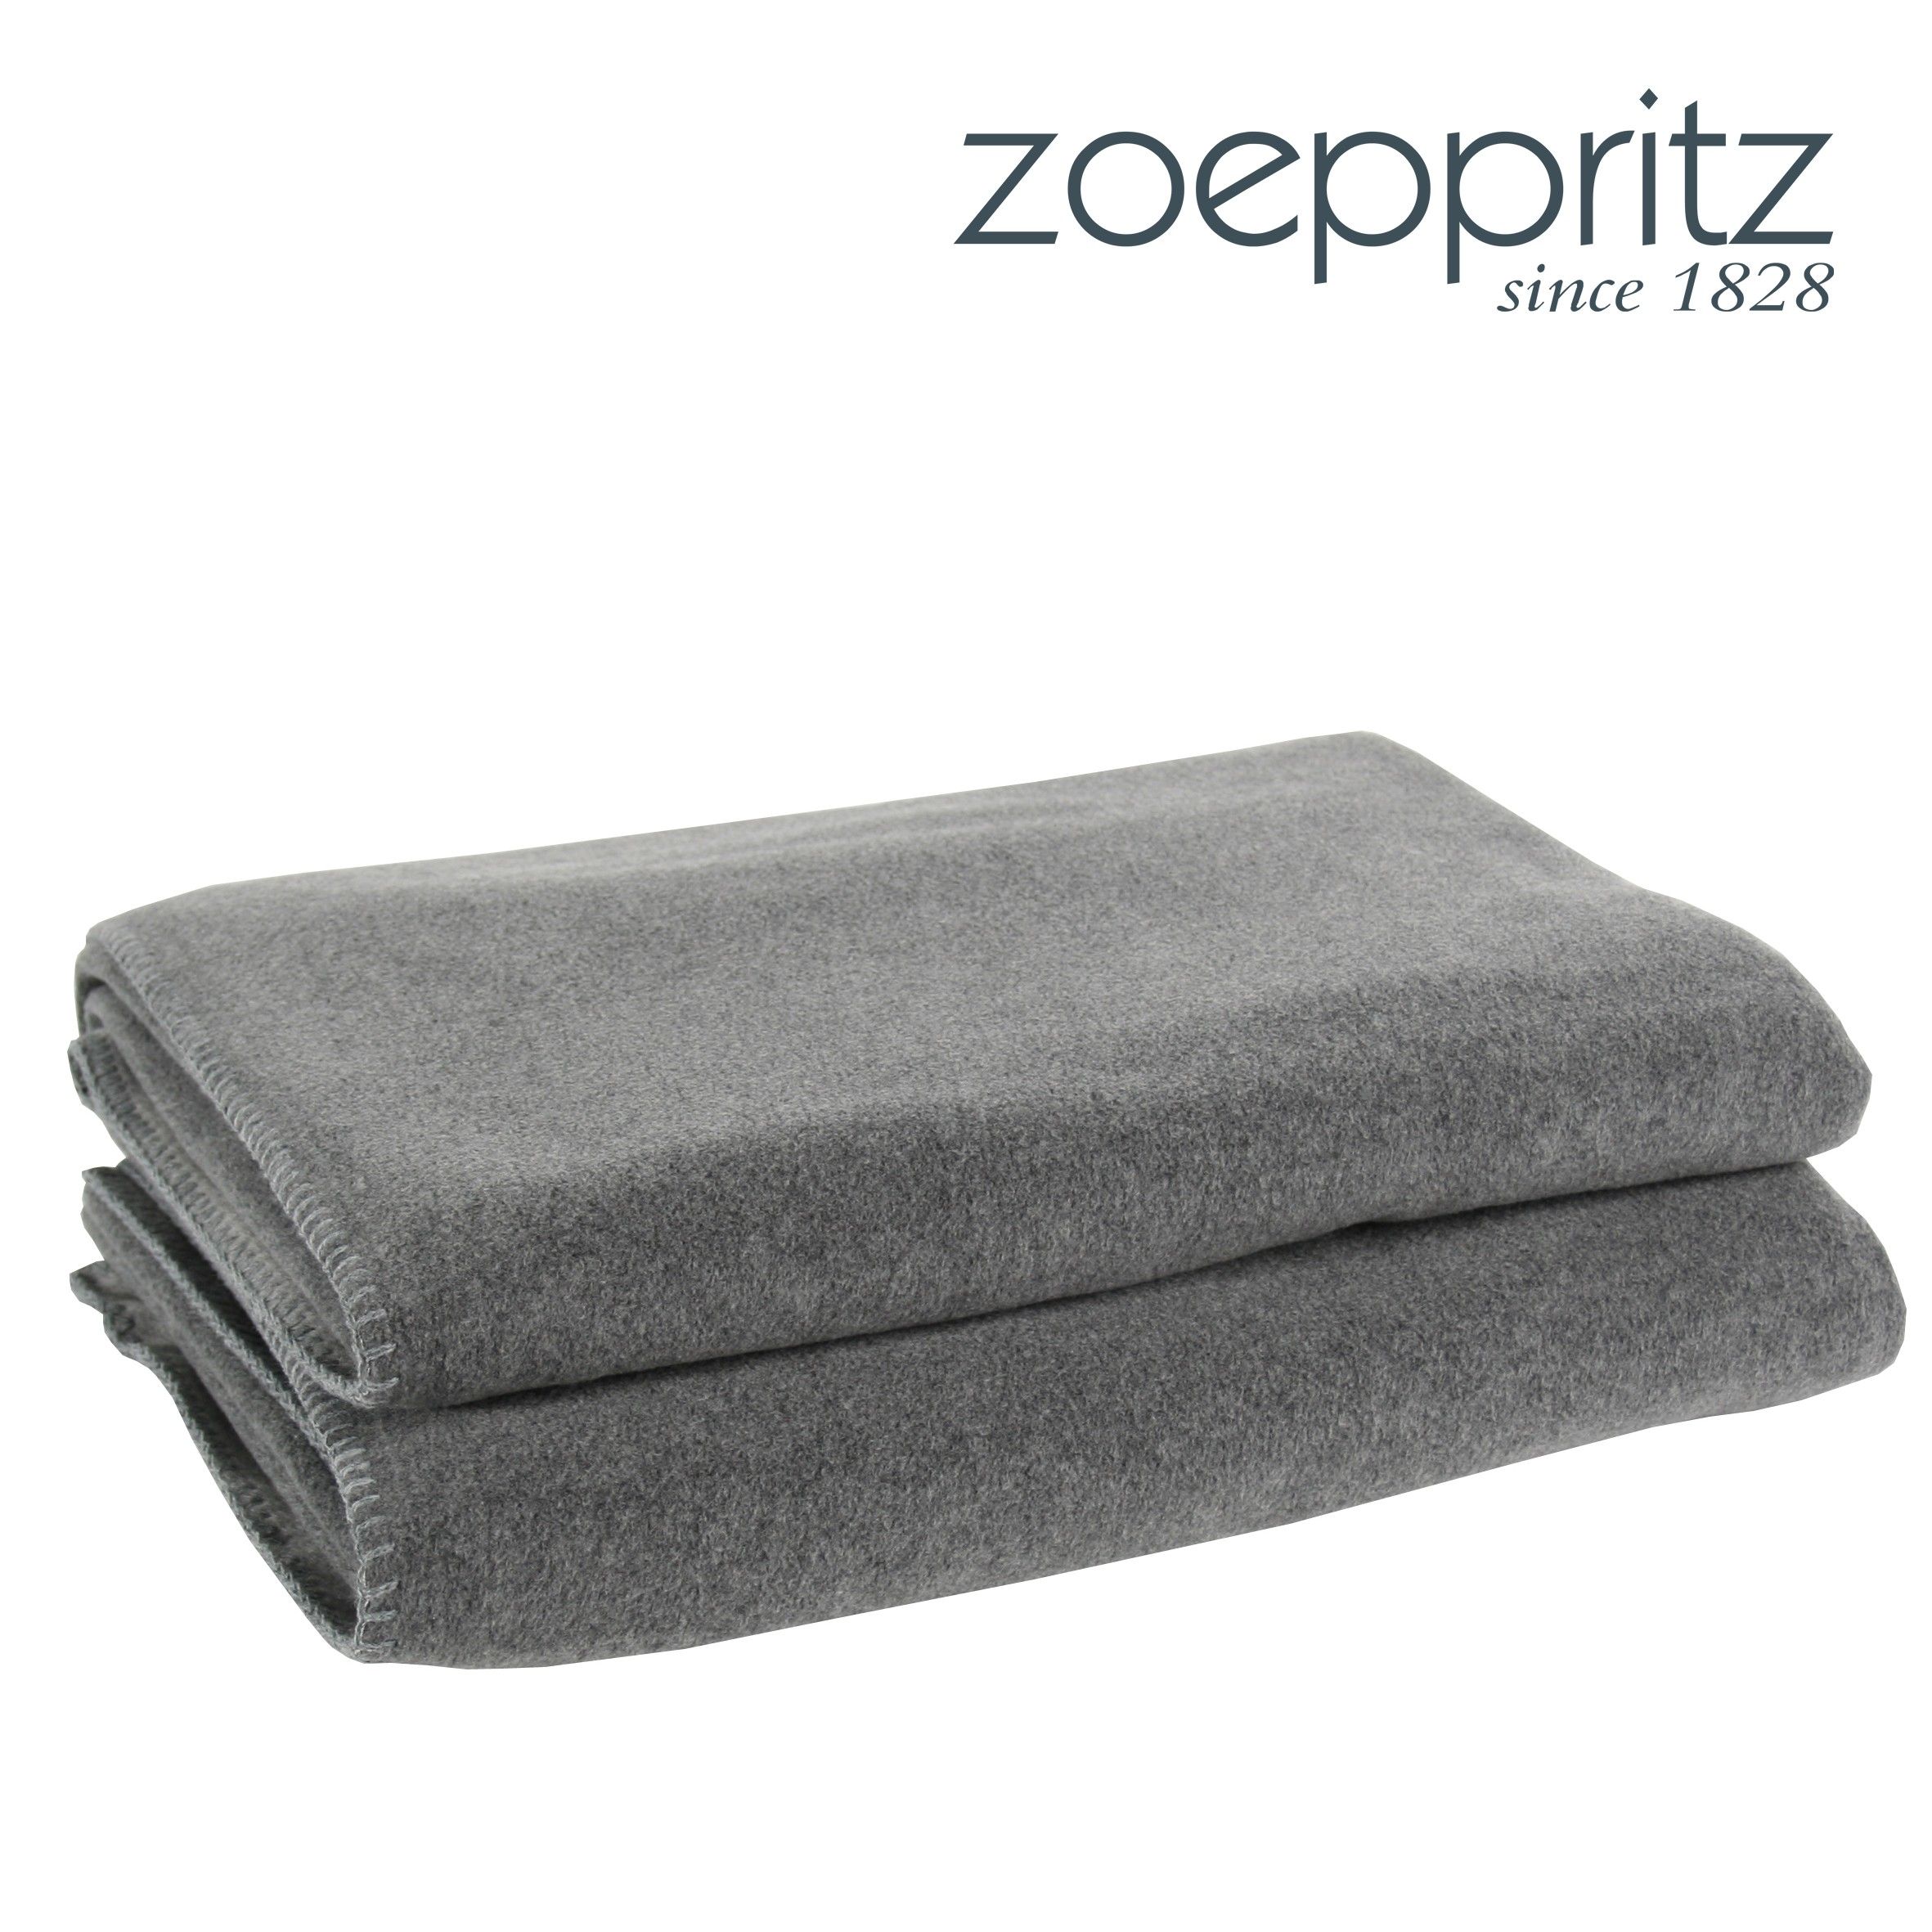 zoeppritz plaid soft fleece mittelgrau. Black Bedroom Furniture Sets. Home Design Ideas